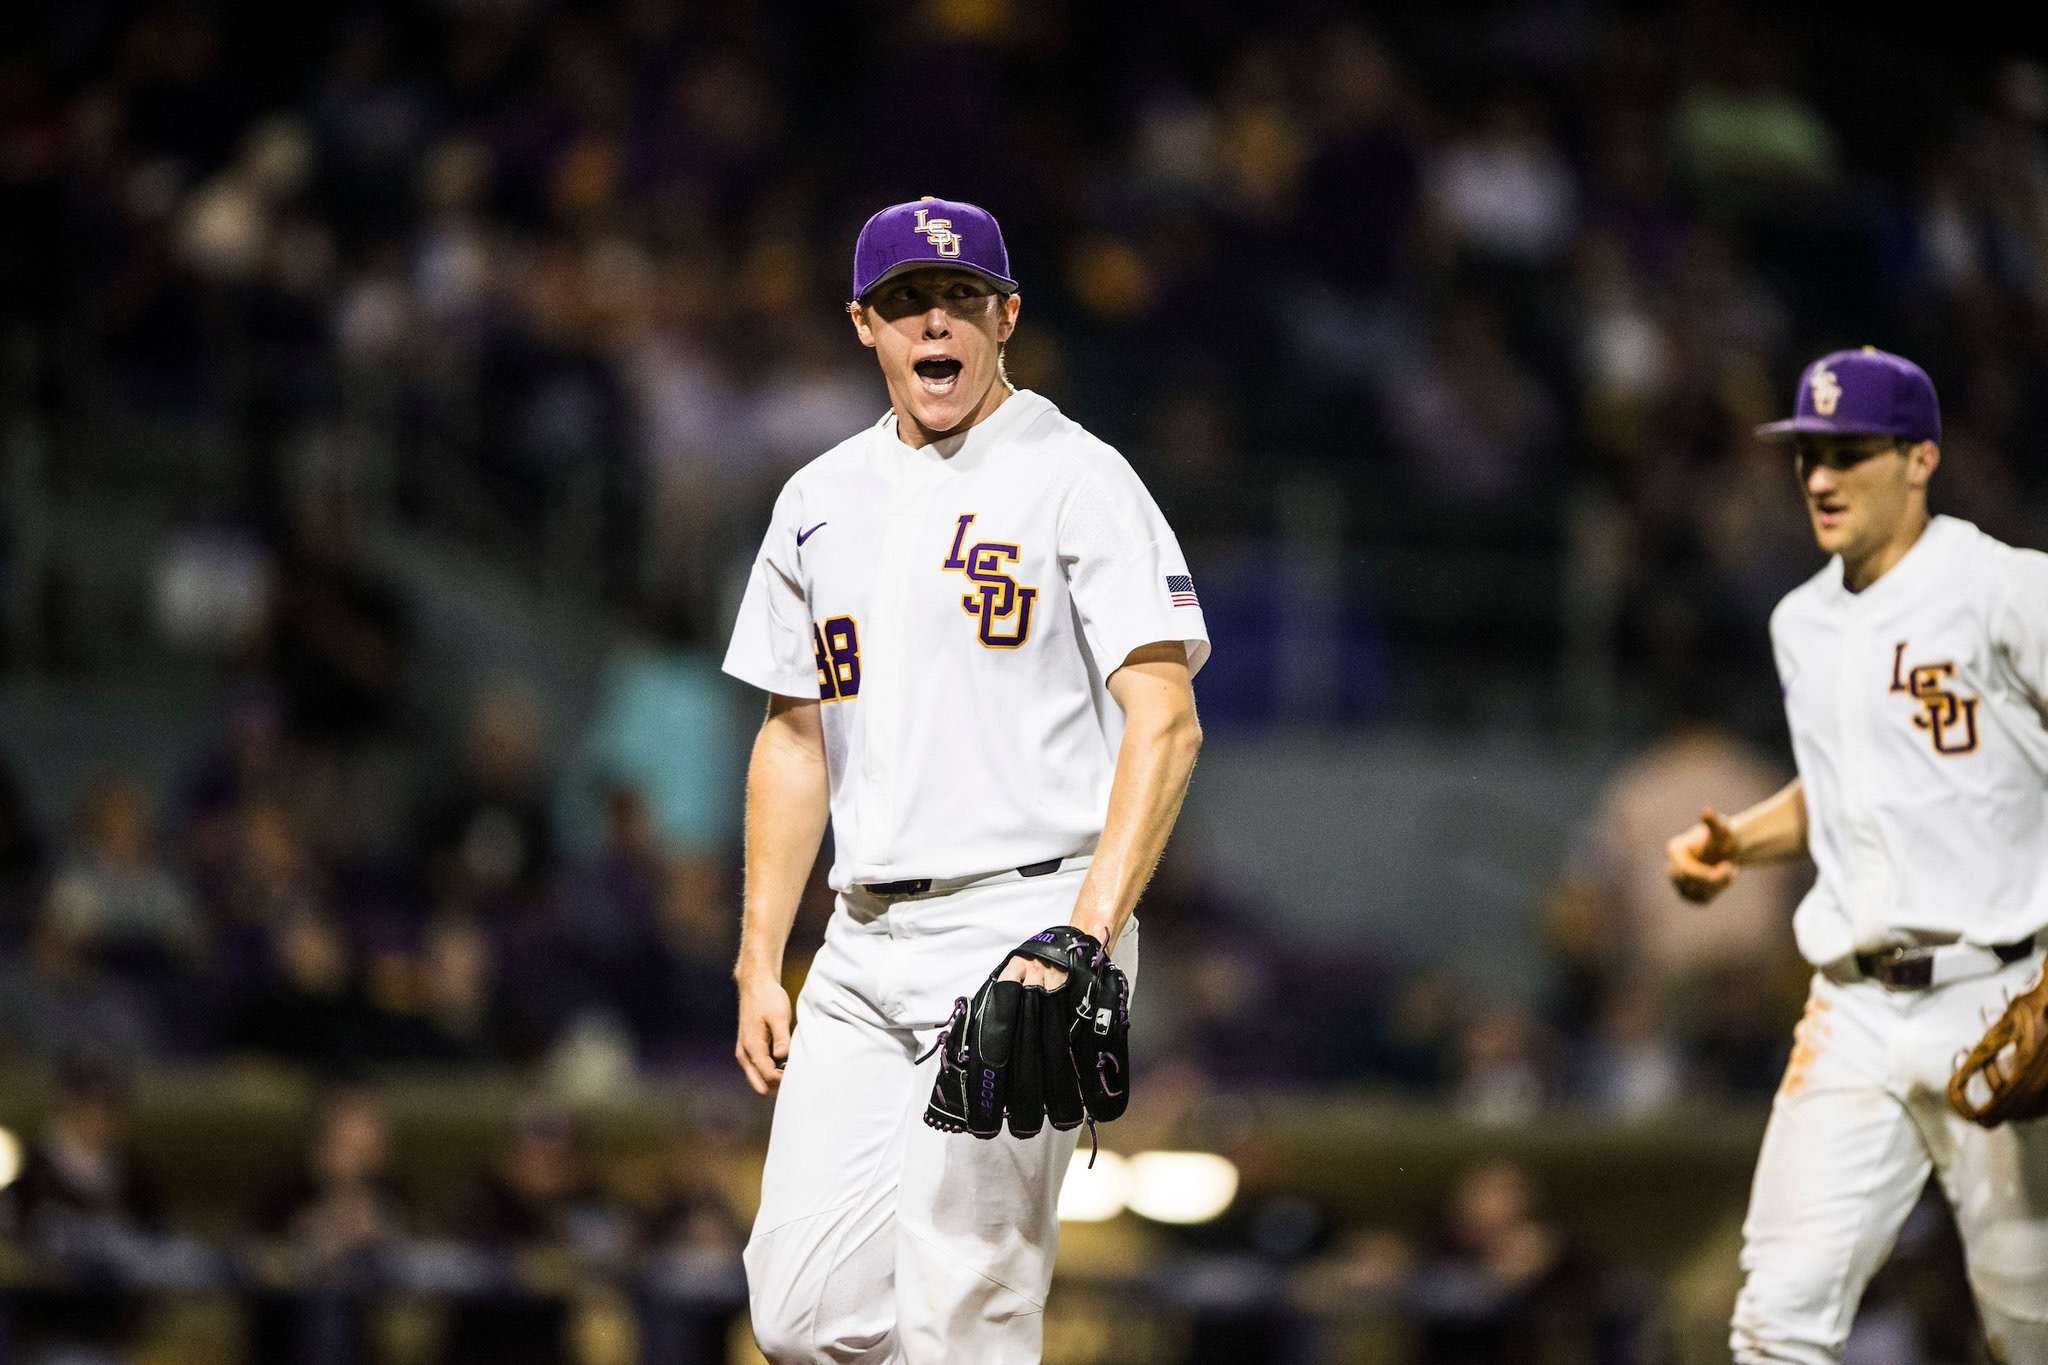 LSU is No. 1 in Collegiate Baseball Preseason Poll